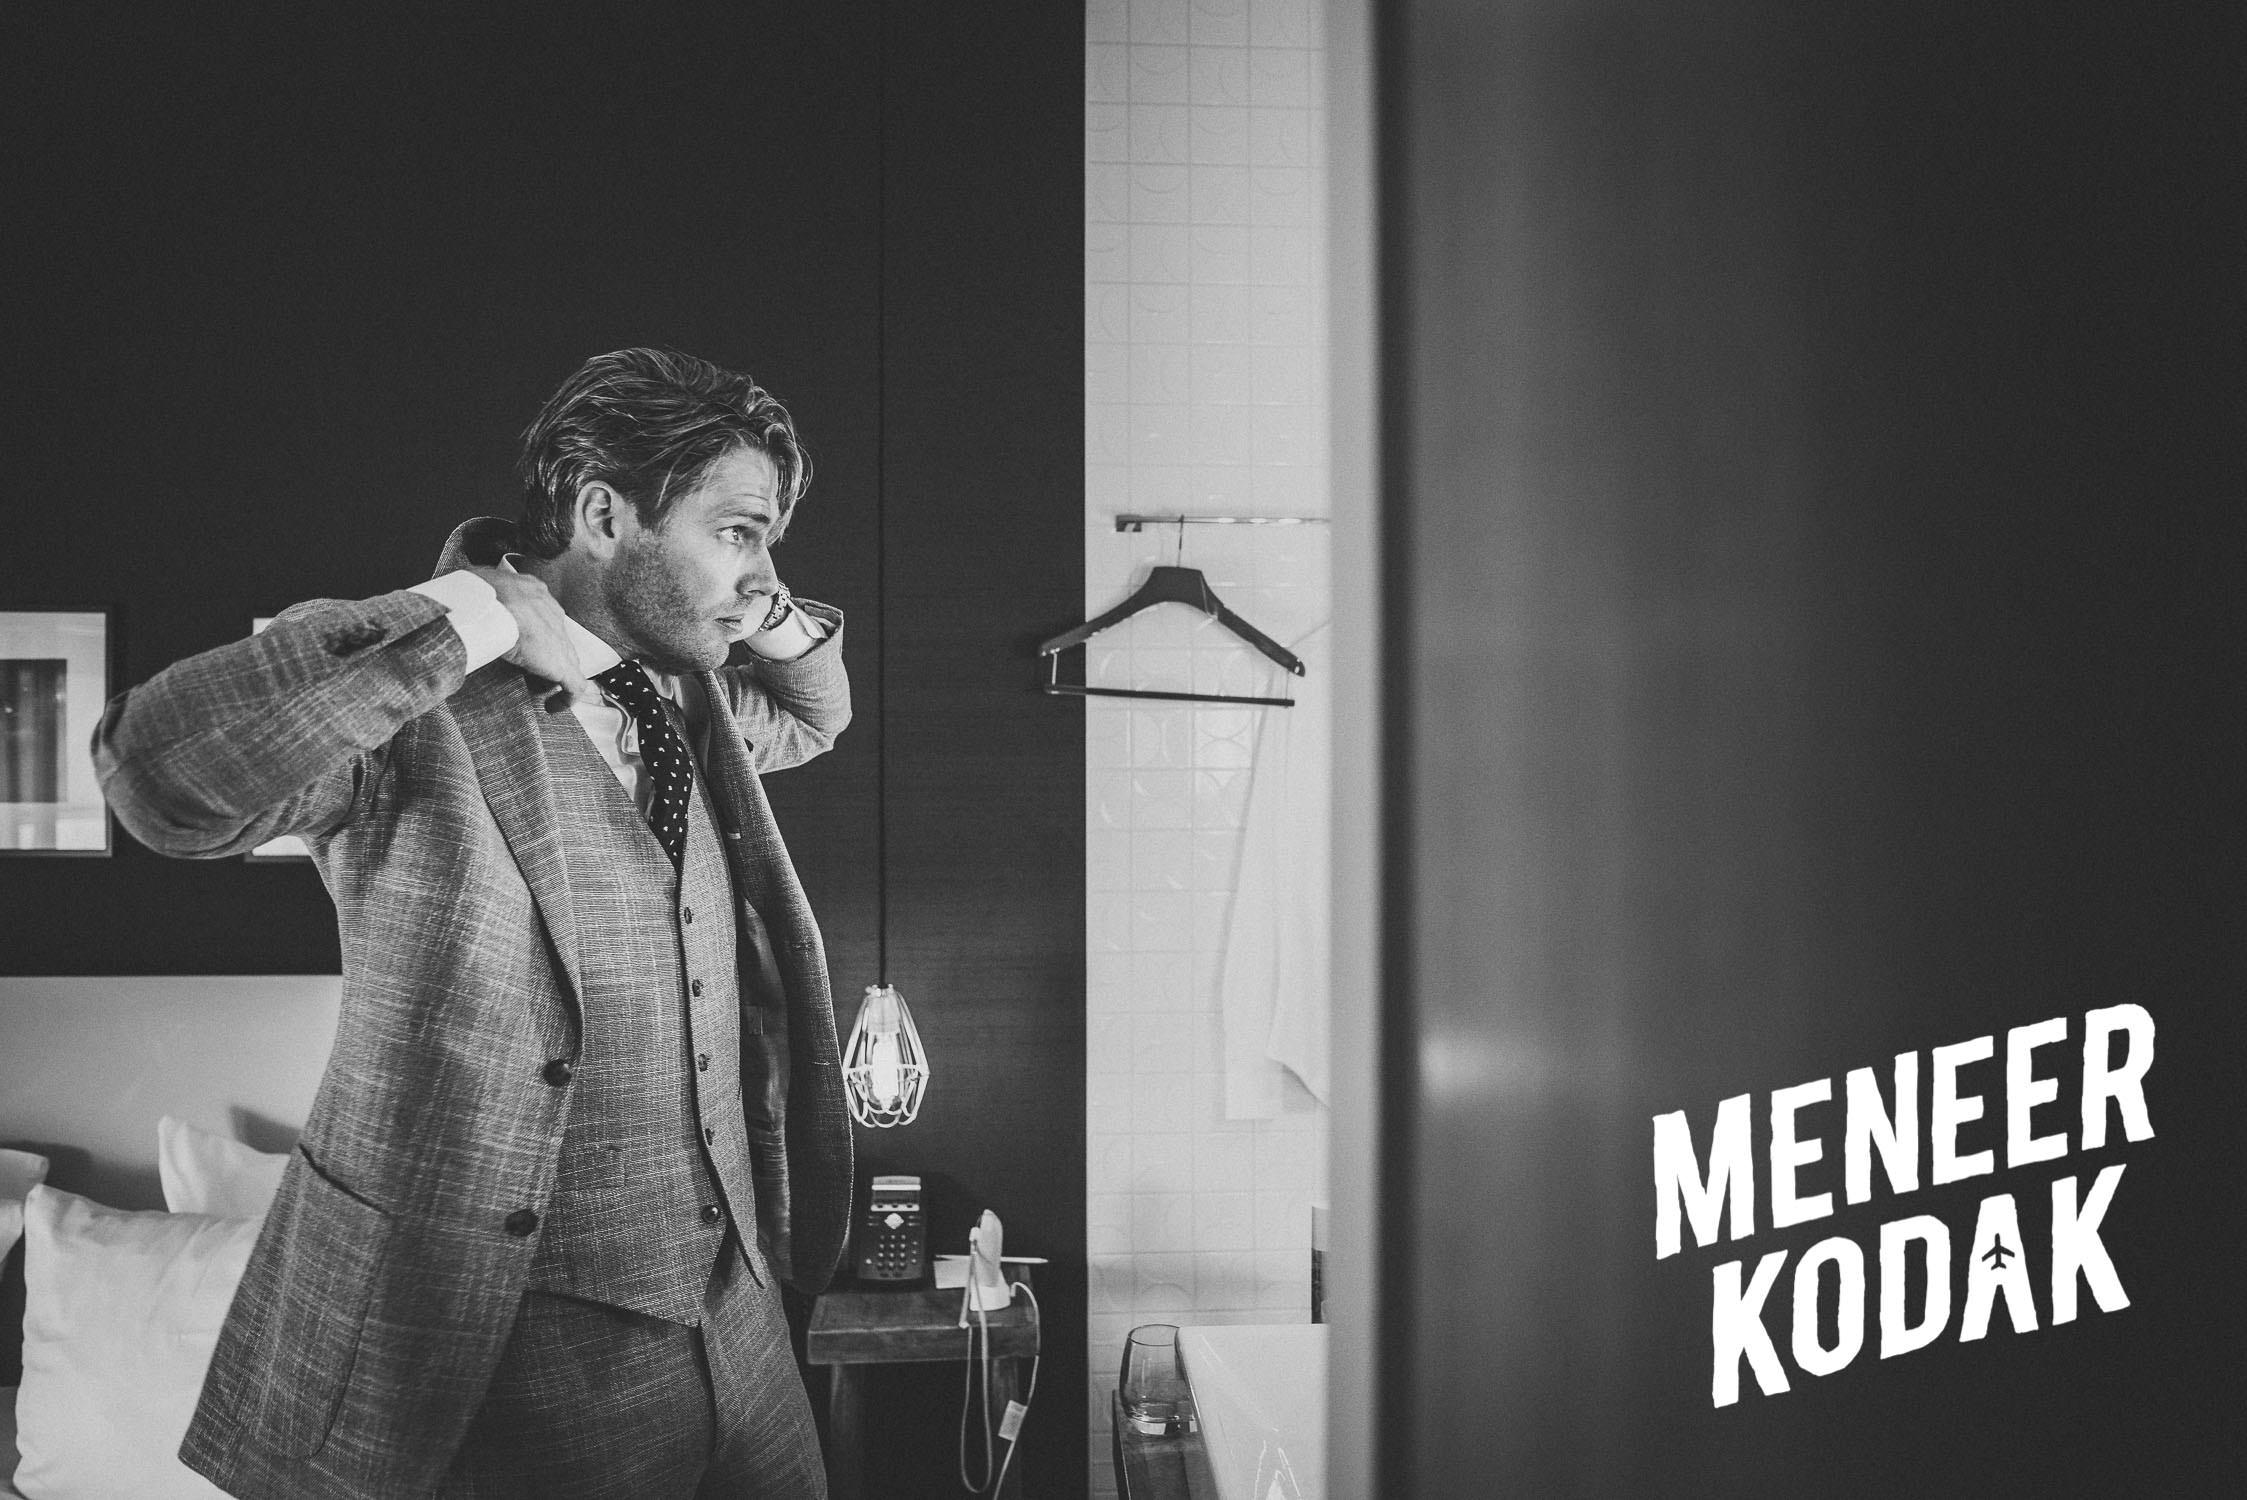 Meneer Kodak - Strandbruiloft - Noordwijk - K&A-059.jpg